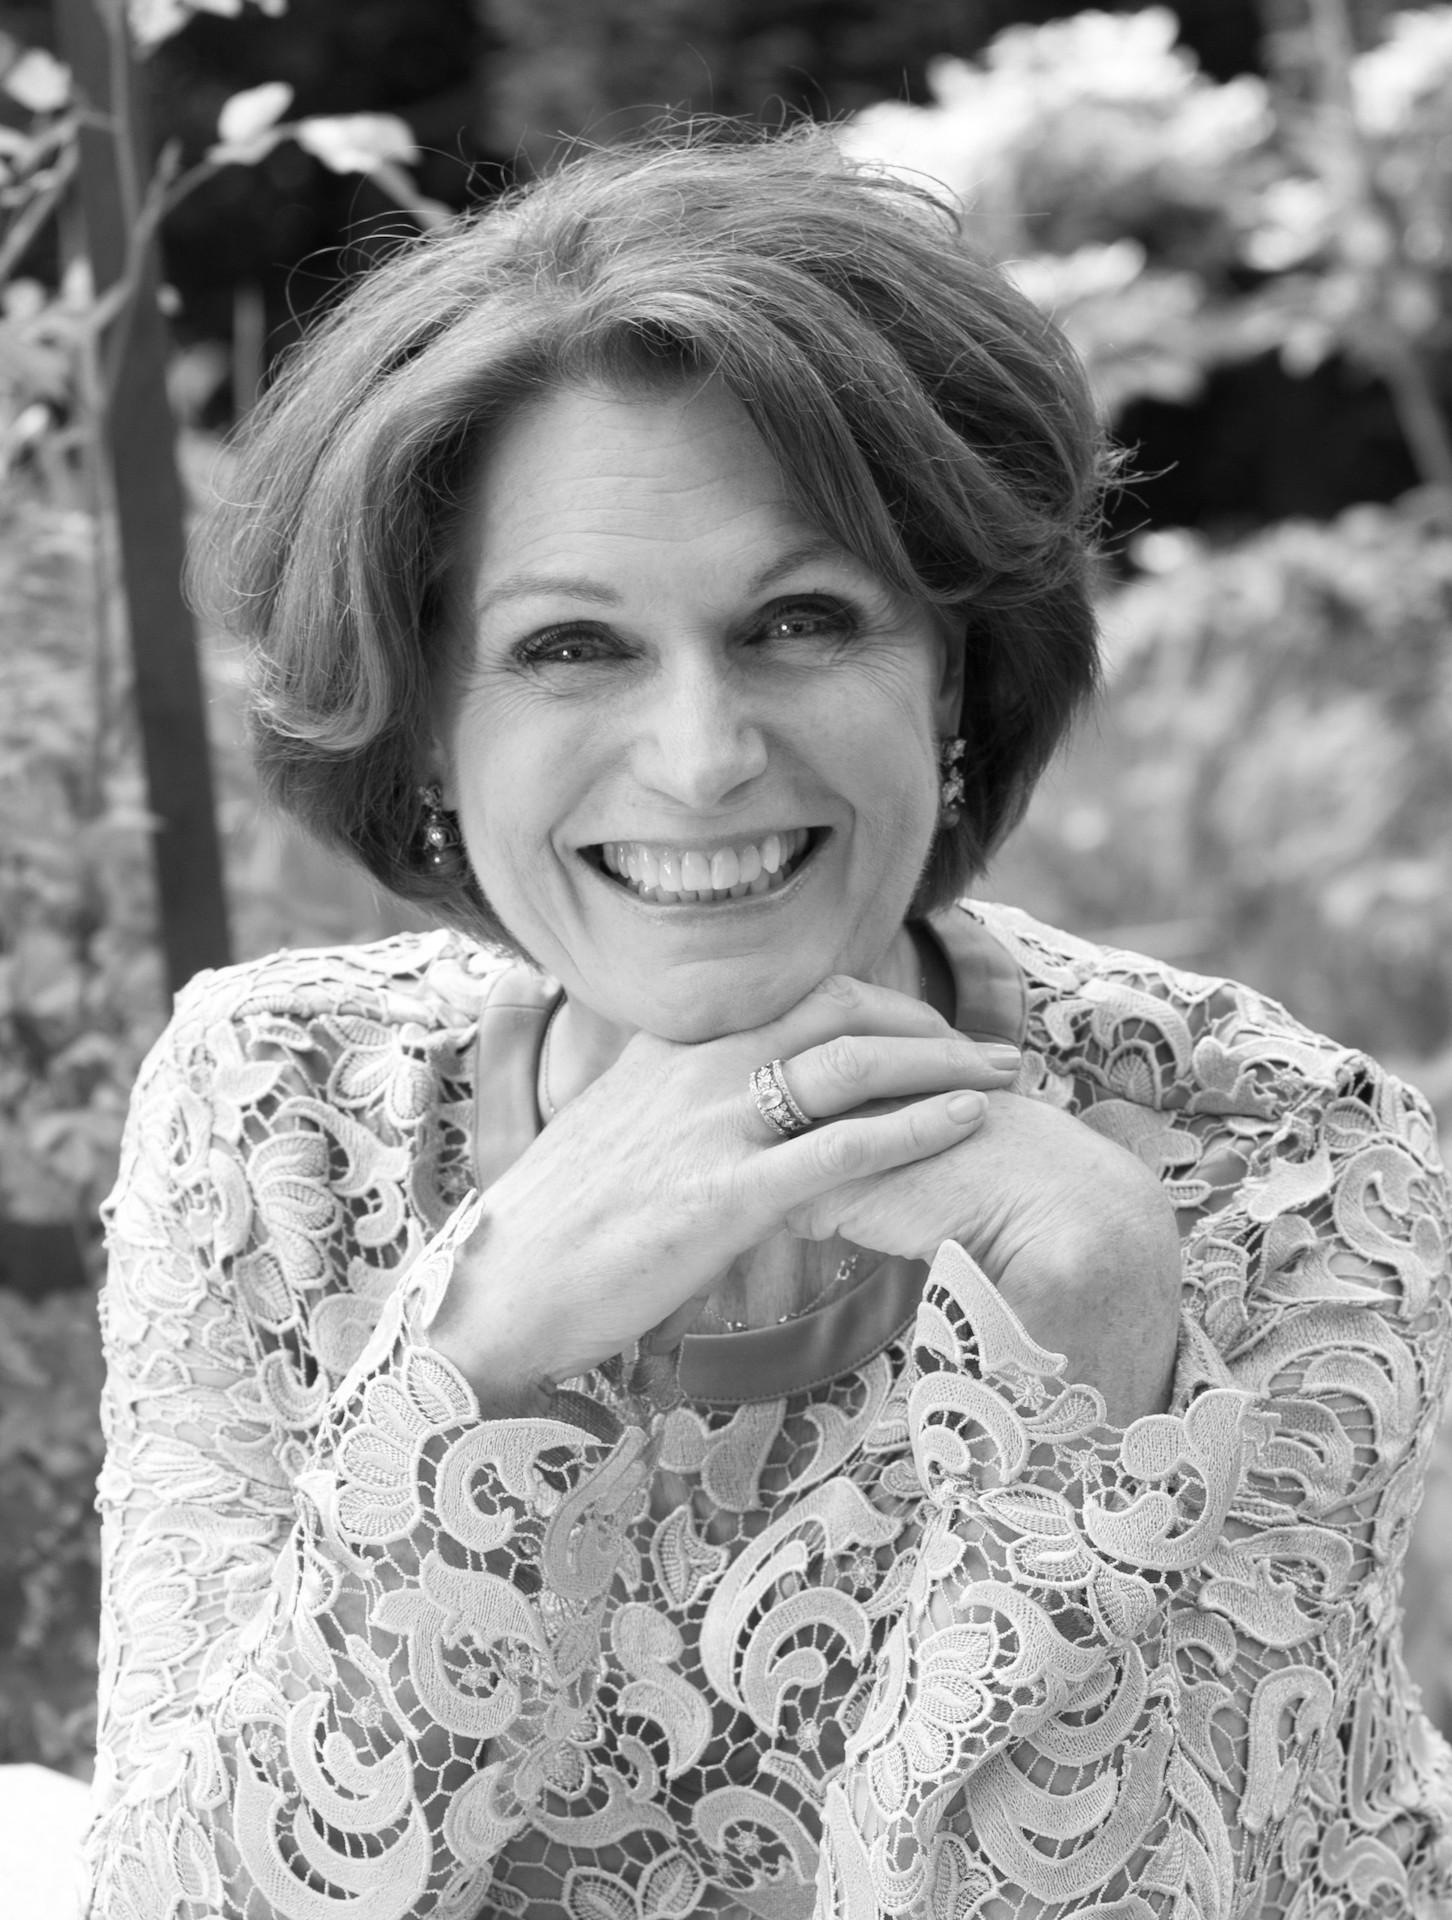 Ook hoofdrol voor Liz Snoijink in musical 'Anastasia'